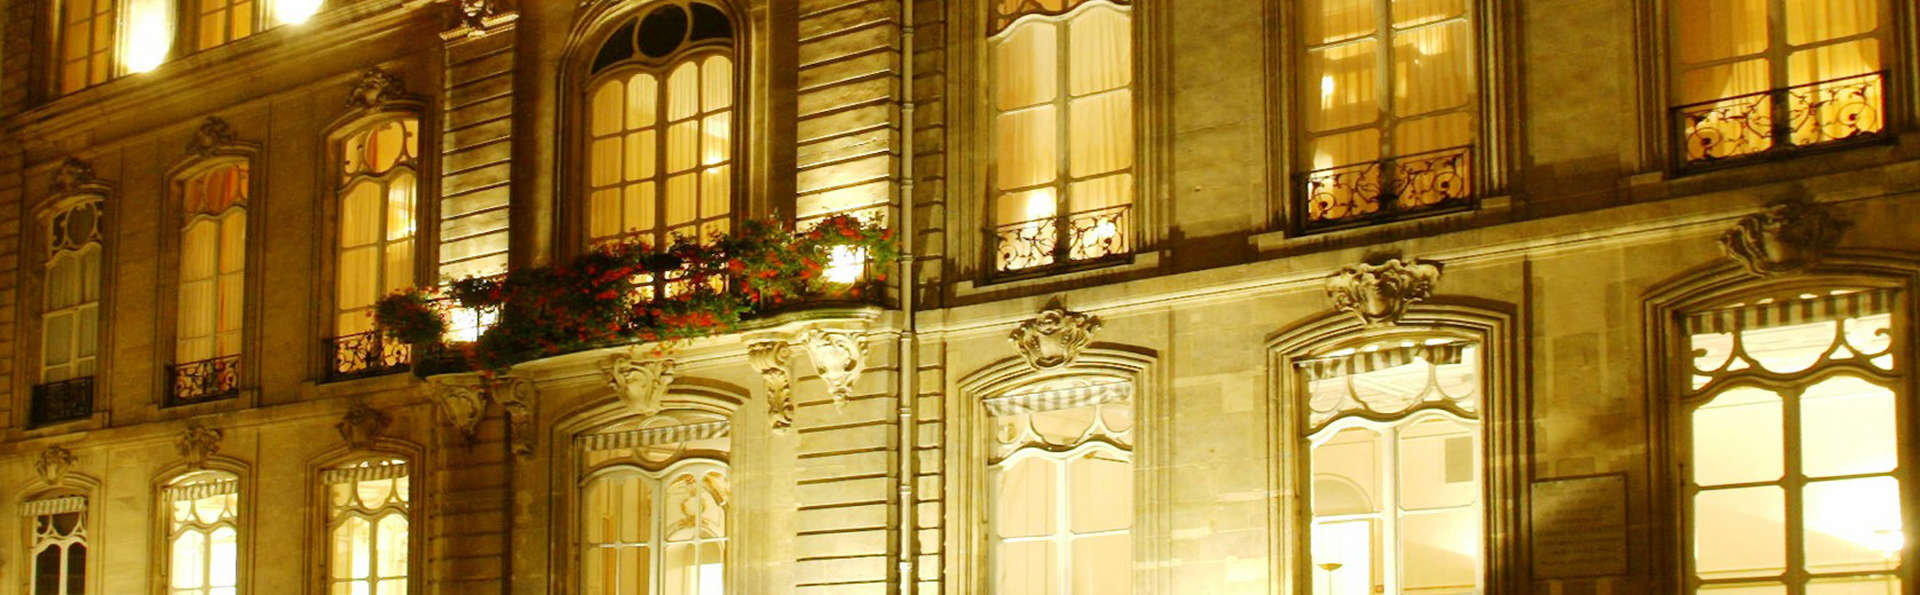 Saint James Albany Paris Hotel Spa - Edit_Front.jpg